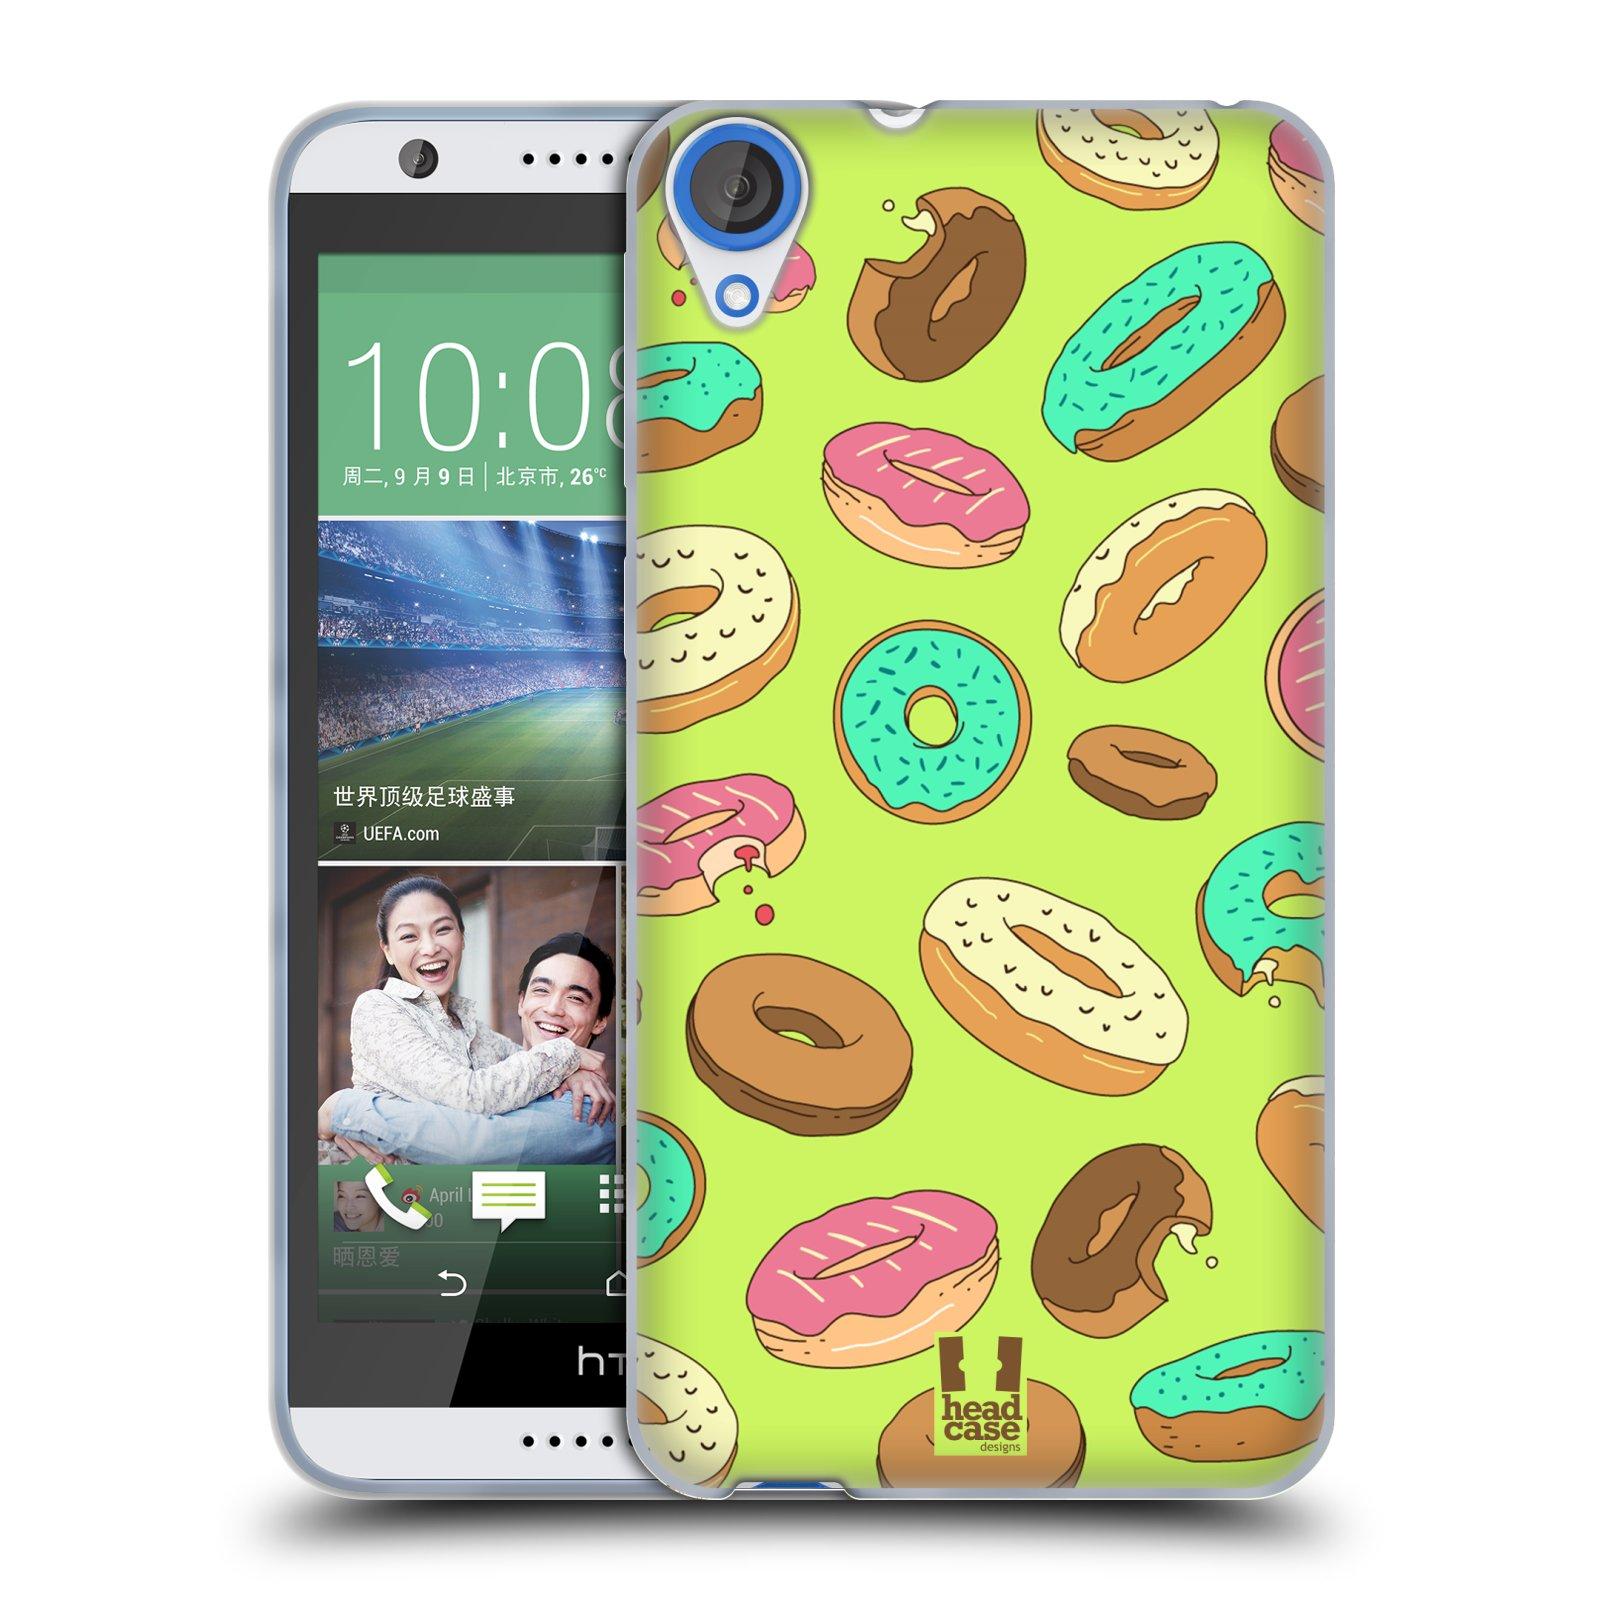 Silikonové pouzdro na mobil HTC Desire 820 HEAD CASE DONUTKY (Silikonový kryt či obal na mobilní telefon HTC Desire 820)